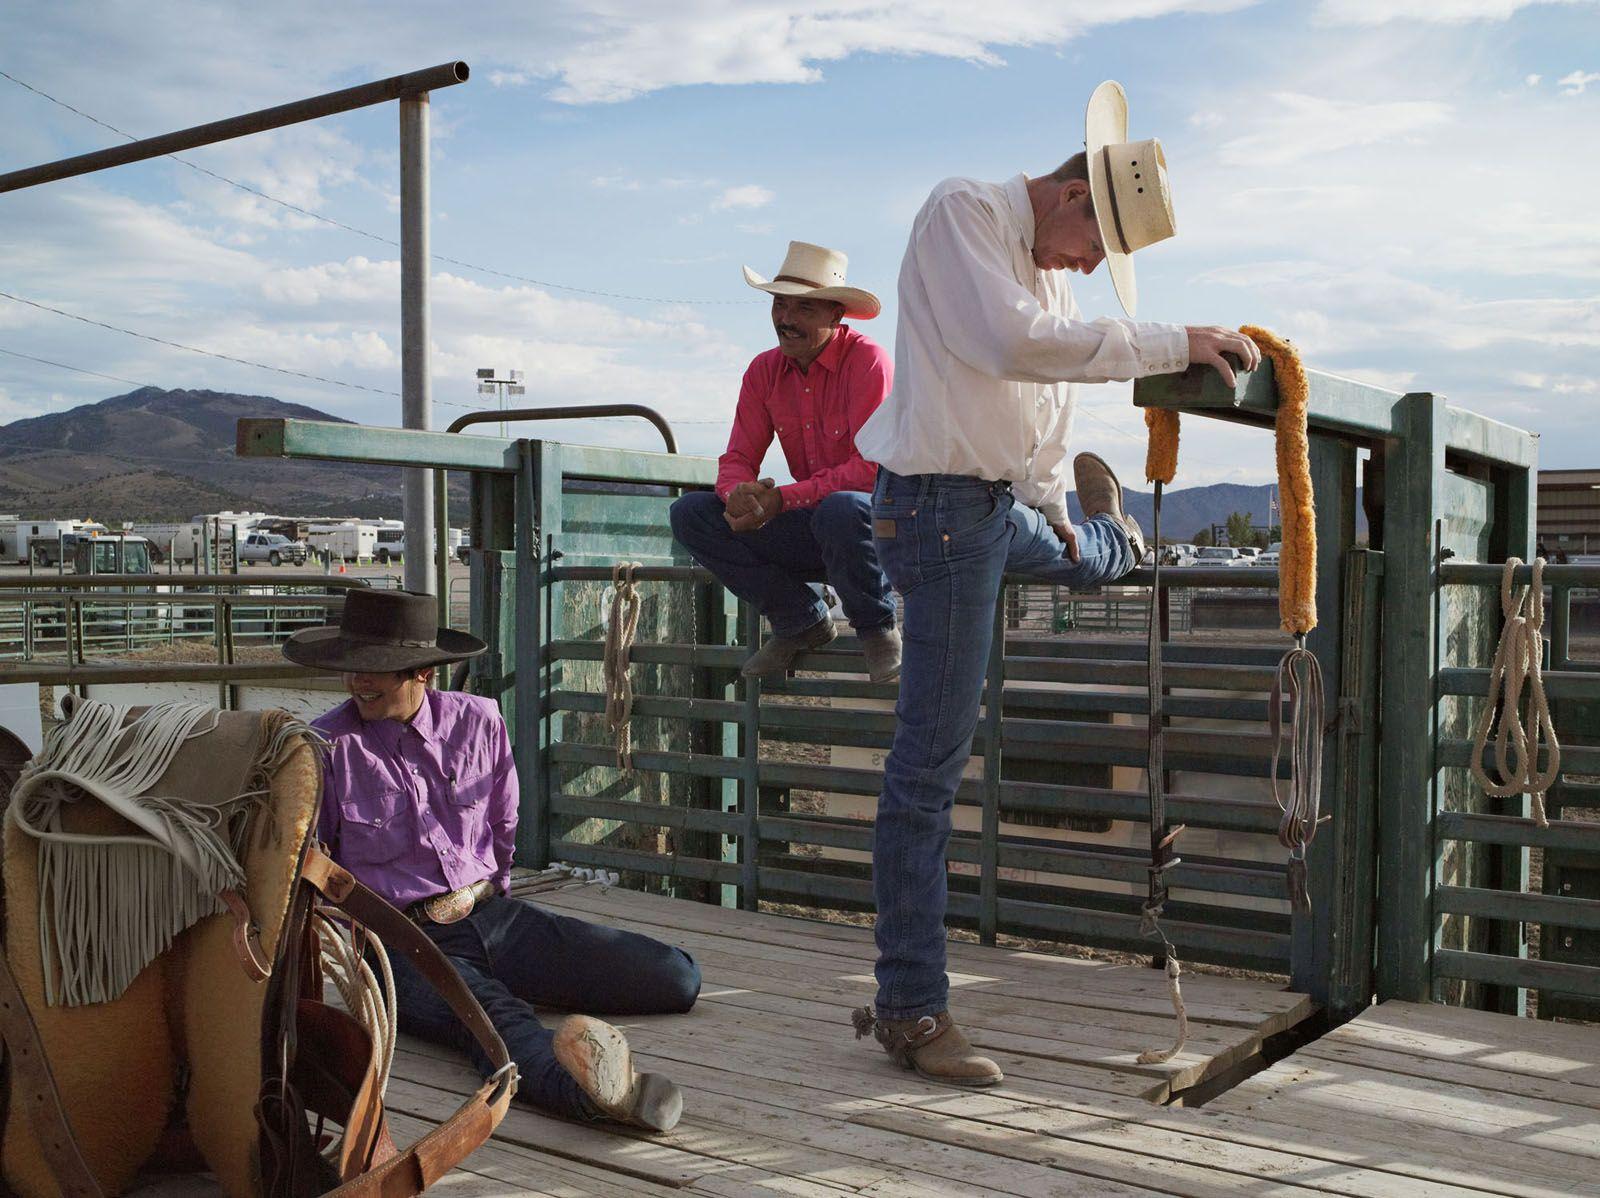 LUCAS FOGLIA, Dakota, Michael, and Jesse, Bronc Riders, Eureka County Fair, Eureka, Nevada, 2012